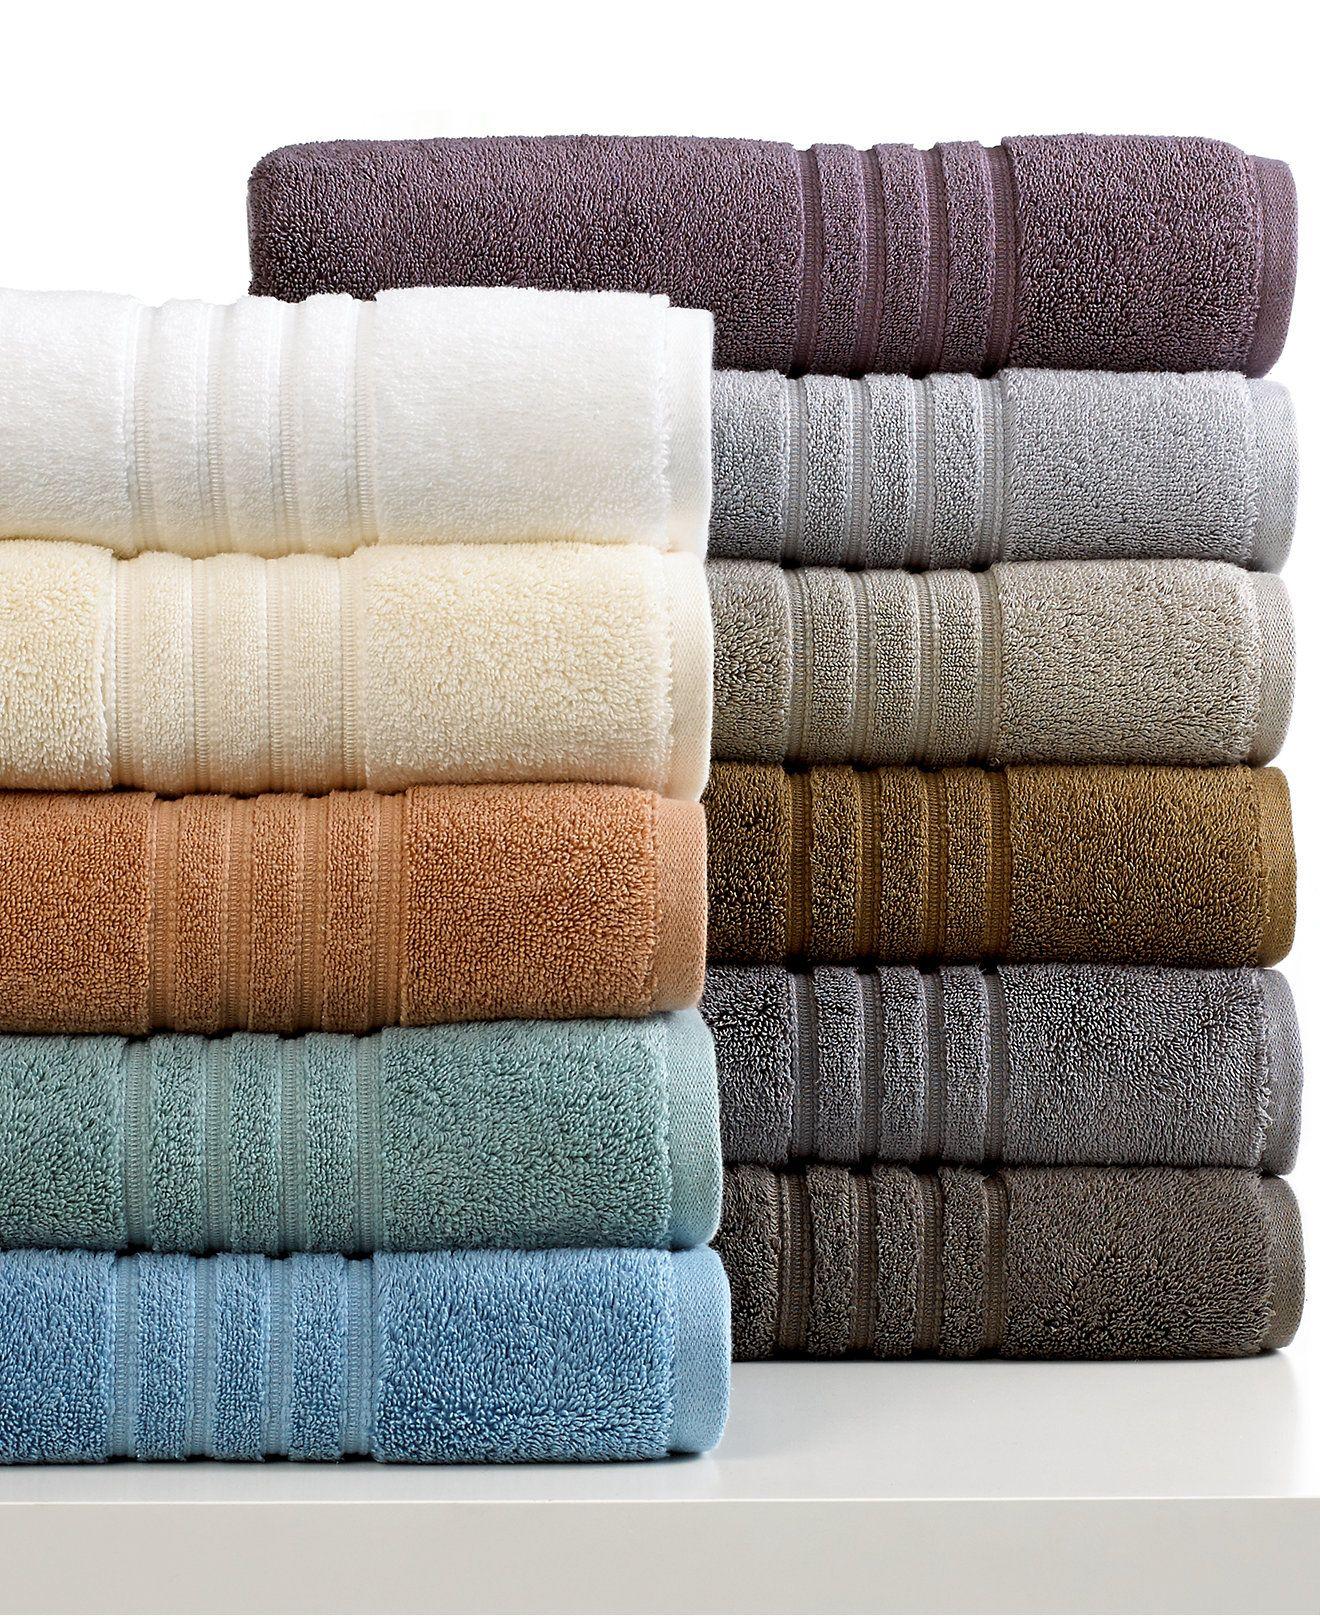 Hotel Collection Microcotton Luxe Bath Towel Collection Bath